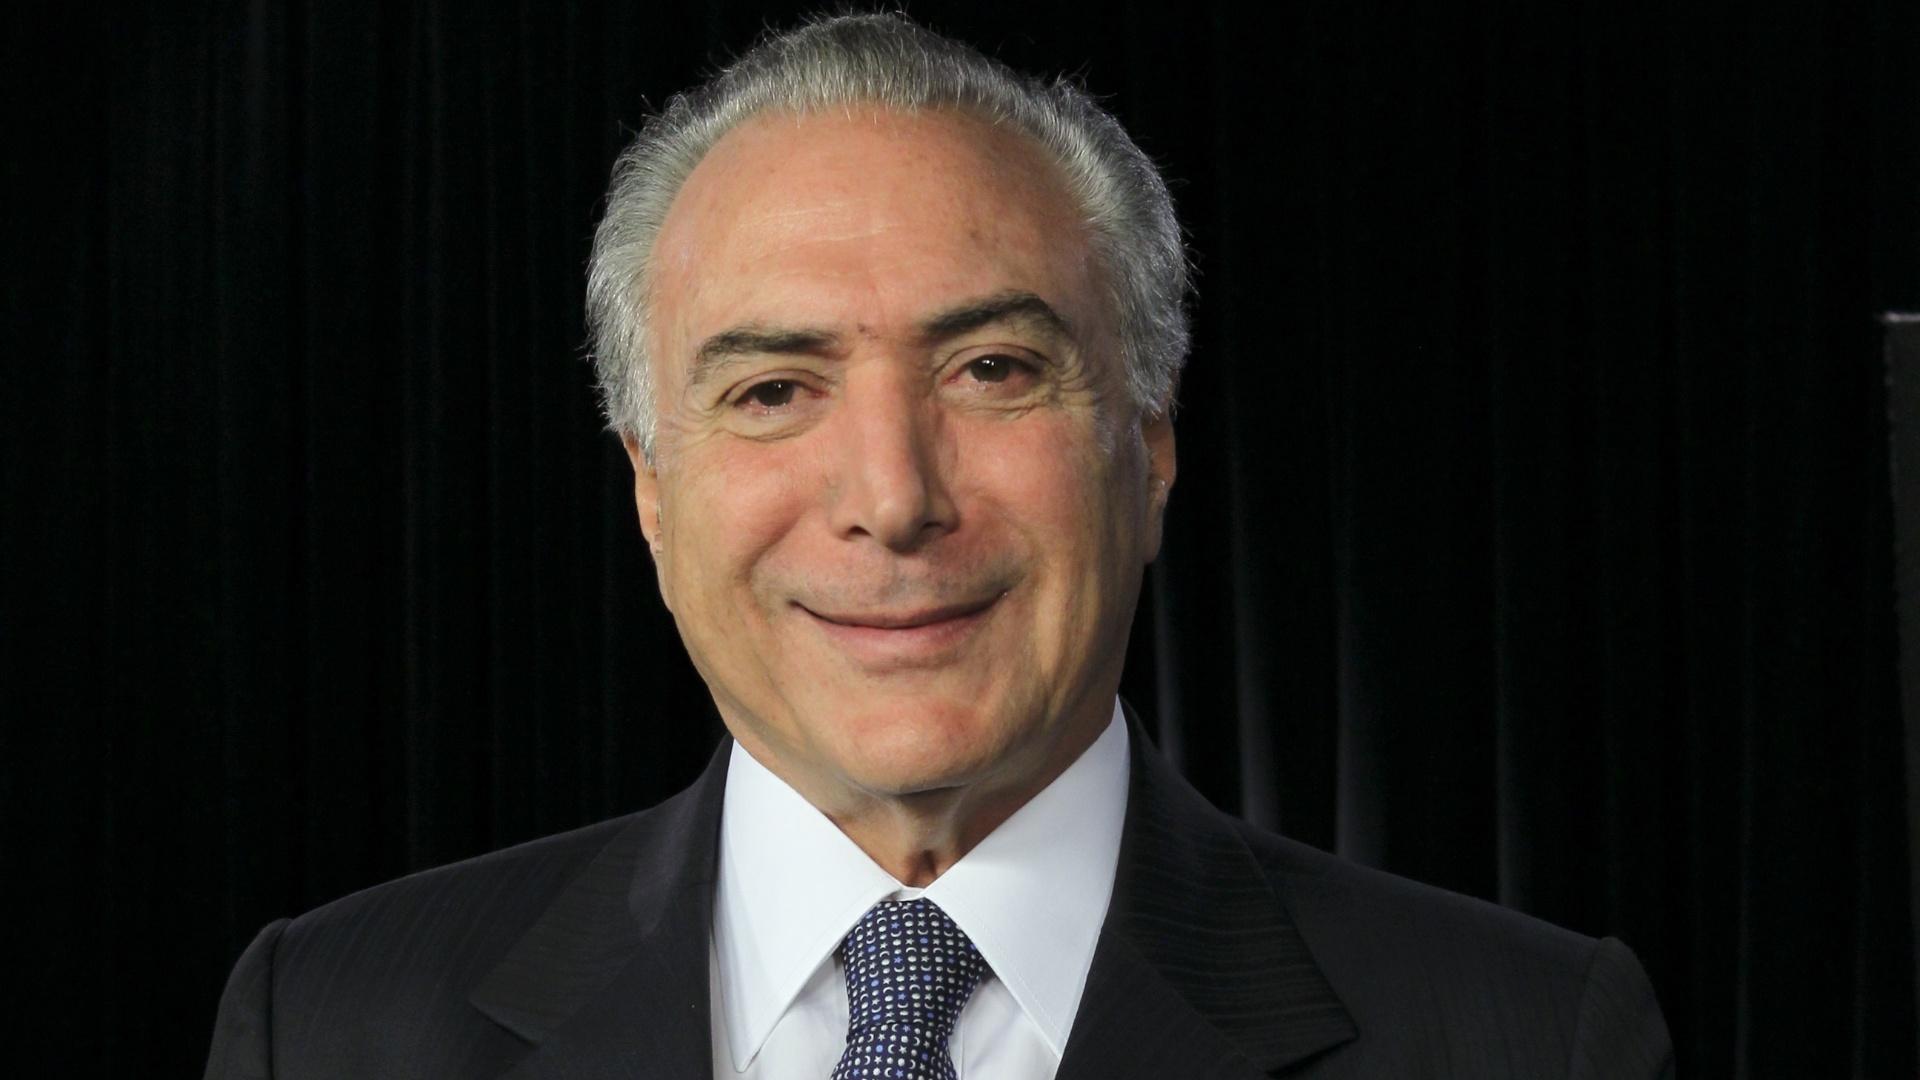 Se houver impeachment, Michel Temer será 22º advogado a presidir o Brasil